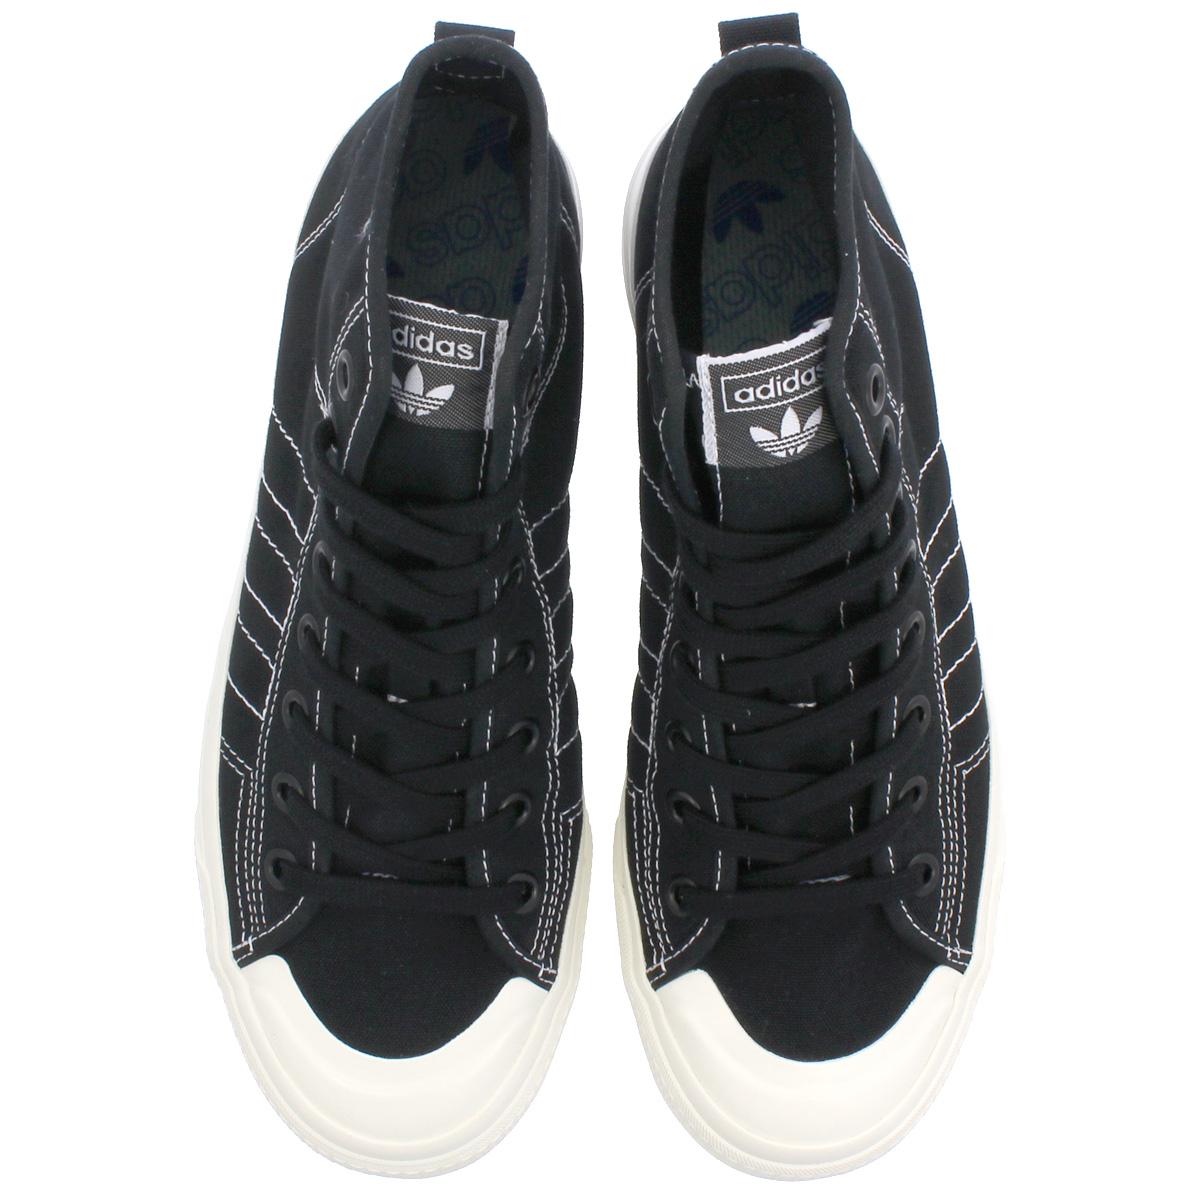 adidas NIZZA HI RF アディダスニッツァハイ RF CORE BLACK RUNNING WHITE OFF WHITE f34057 216d97c2f